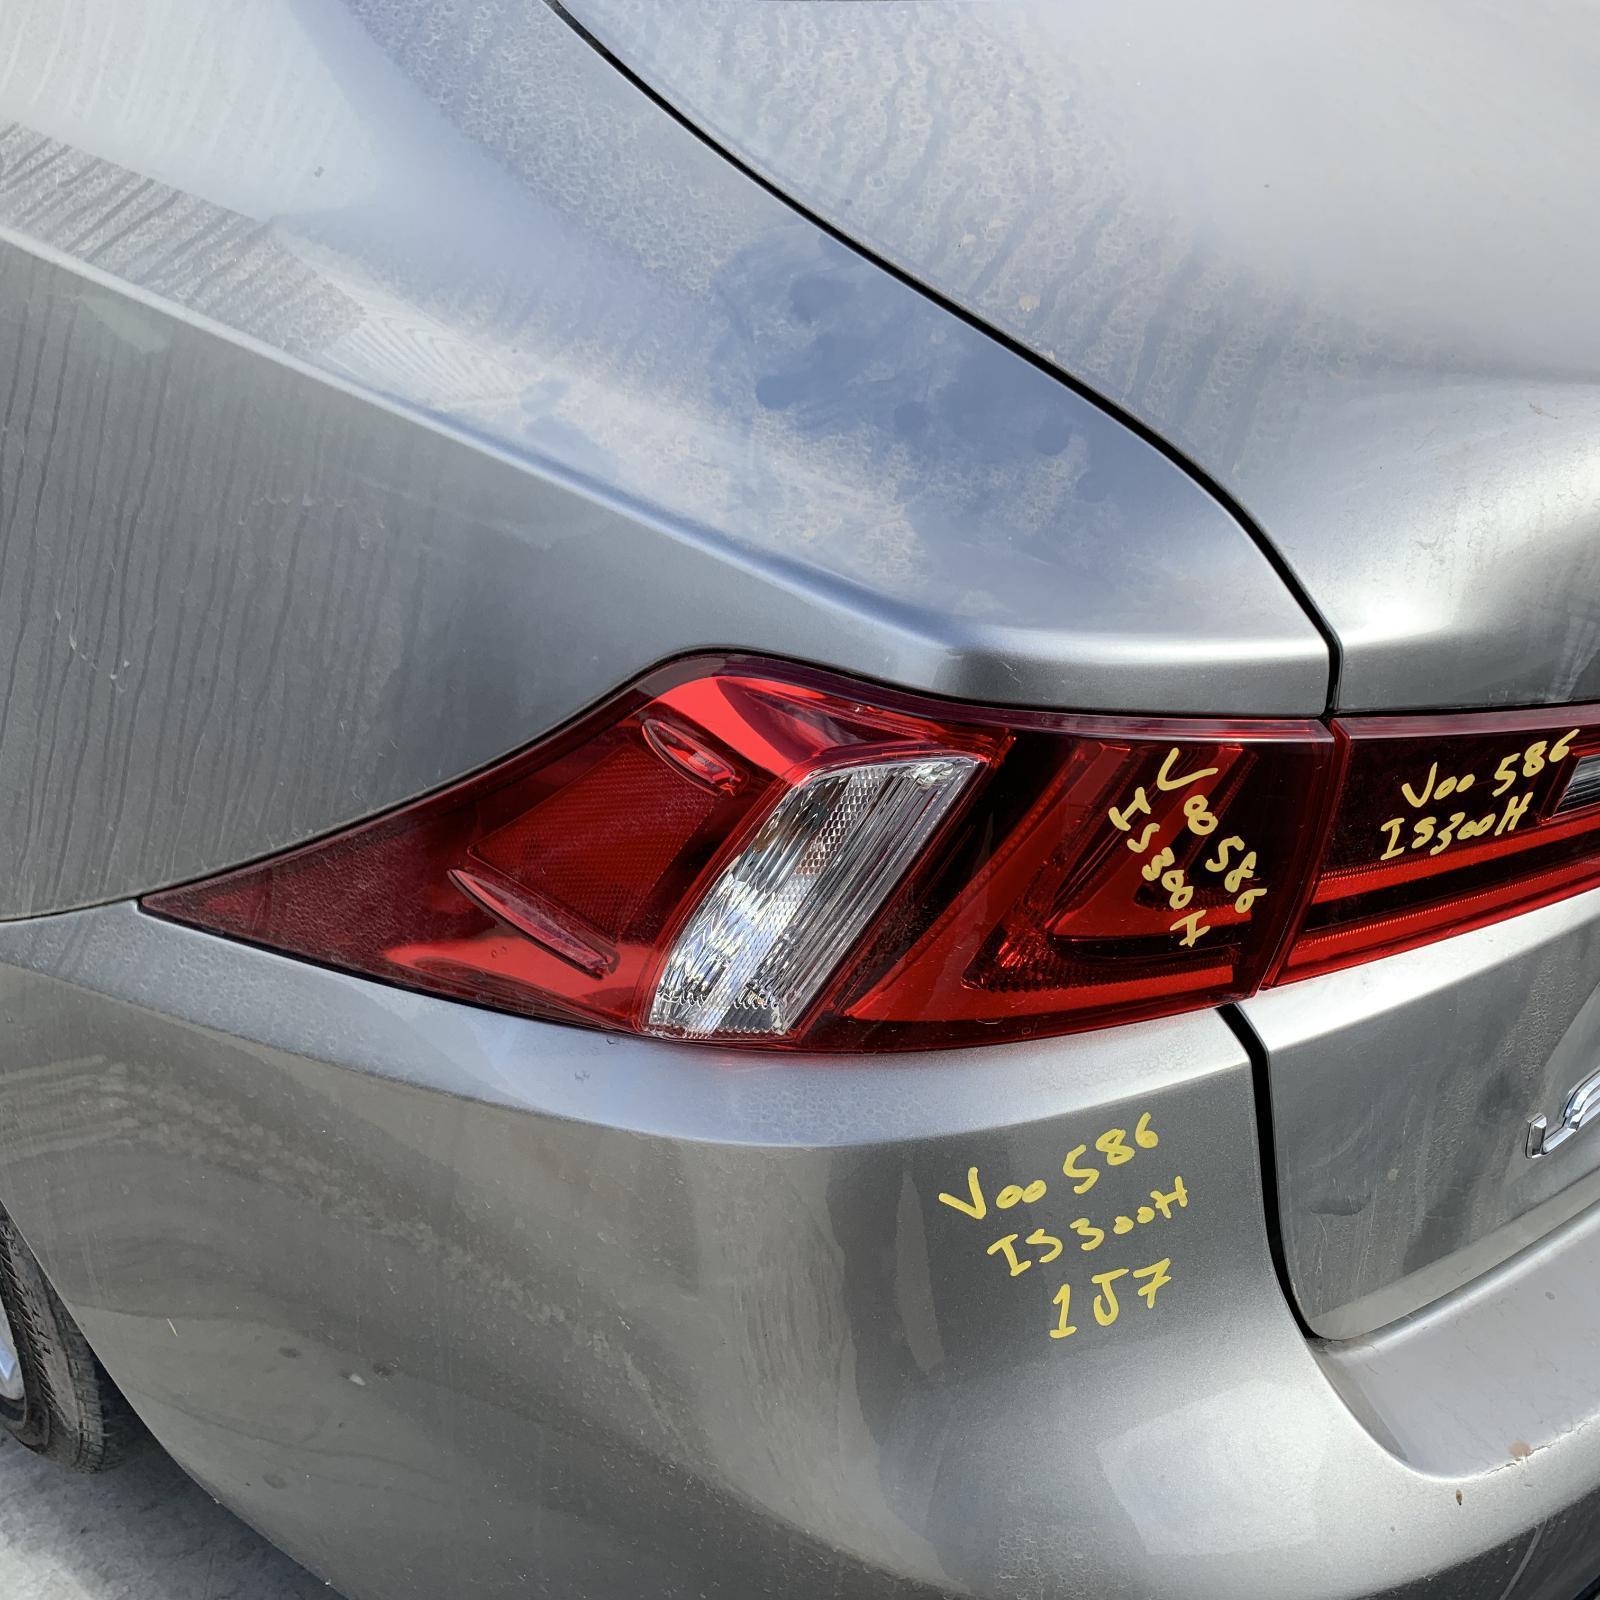 LEXUS IS, Left Taillight, IS200t/IS250/IS300H/IS350, XE30, 04/13-